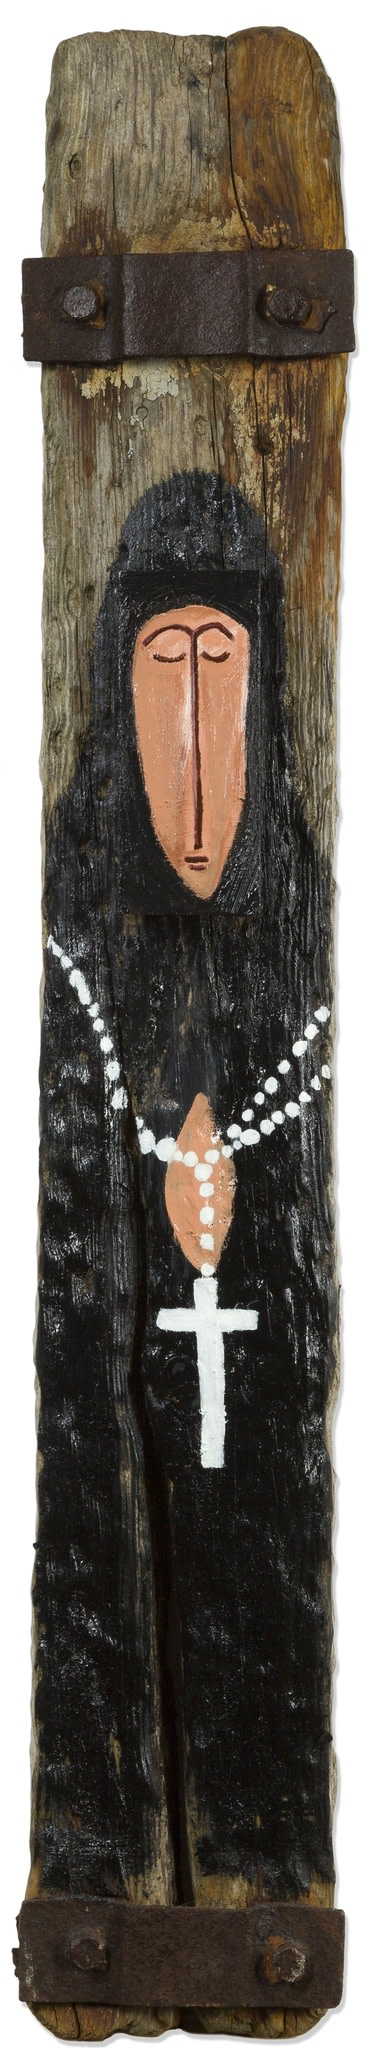 Stephen Anthony Davids, Virgin Mary, 2014